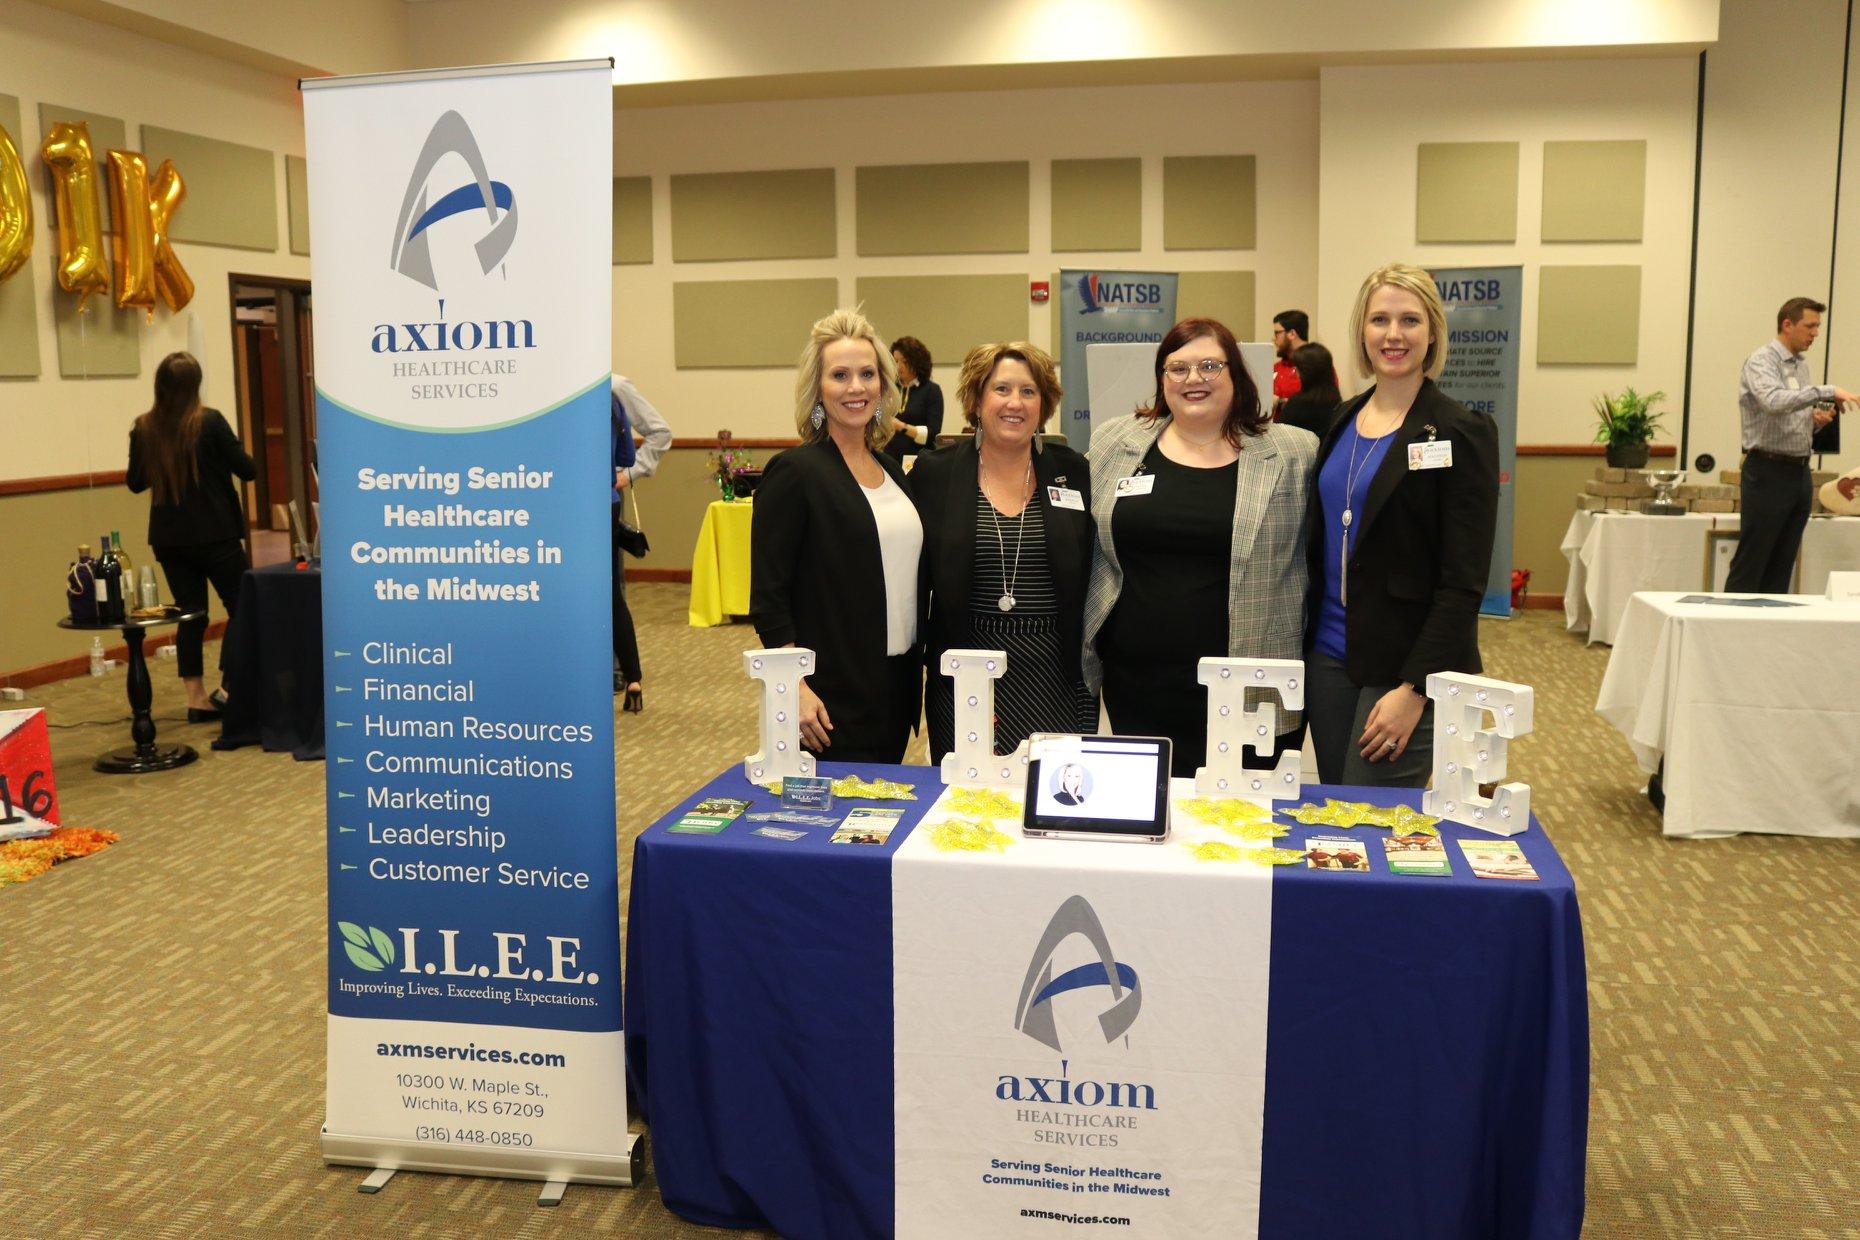 Axiom employees: Stephanie Wiens, Brenda Kruse, Dayna Hoock, and Madison Osoba.